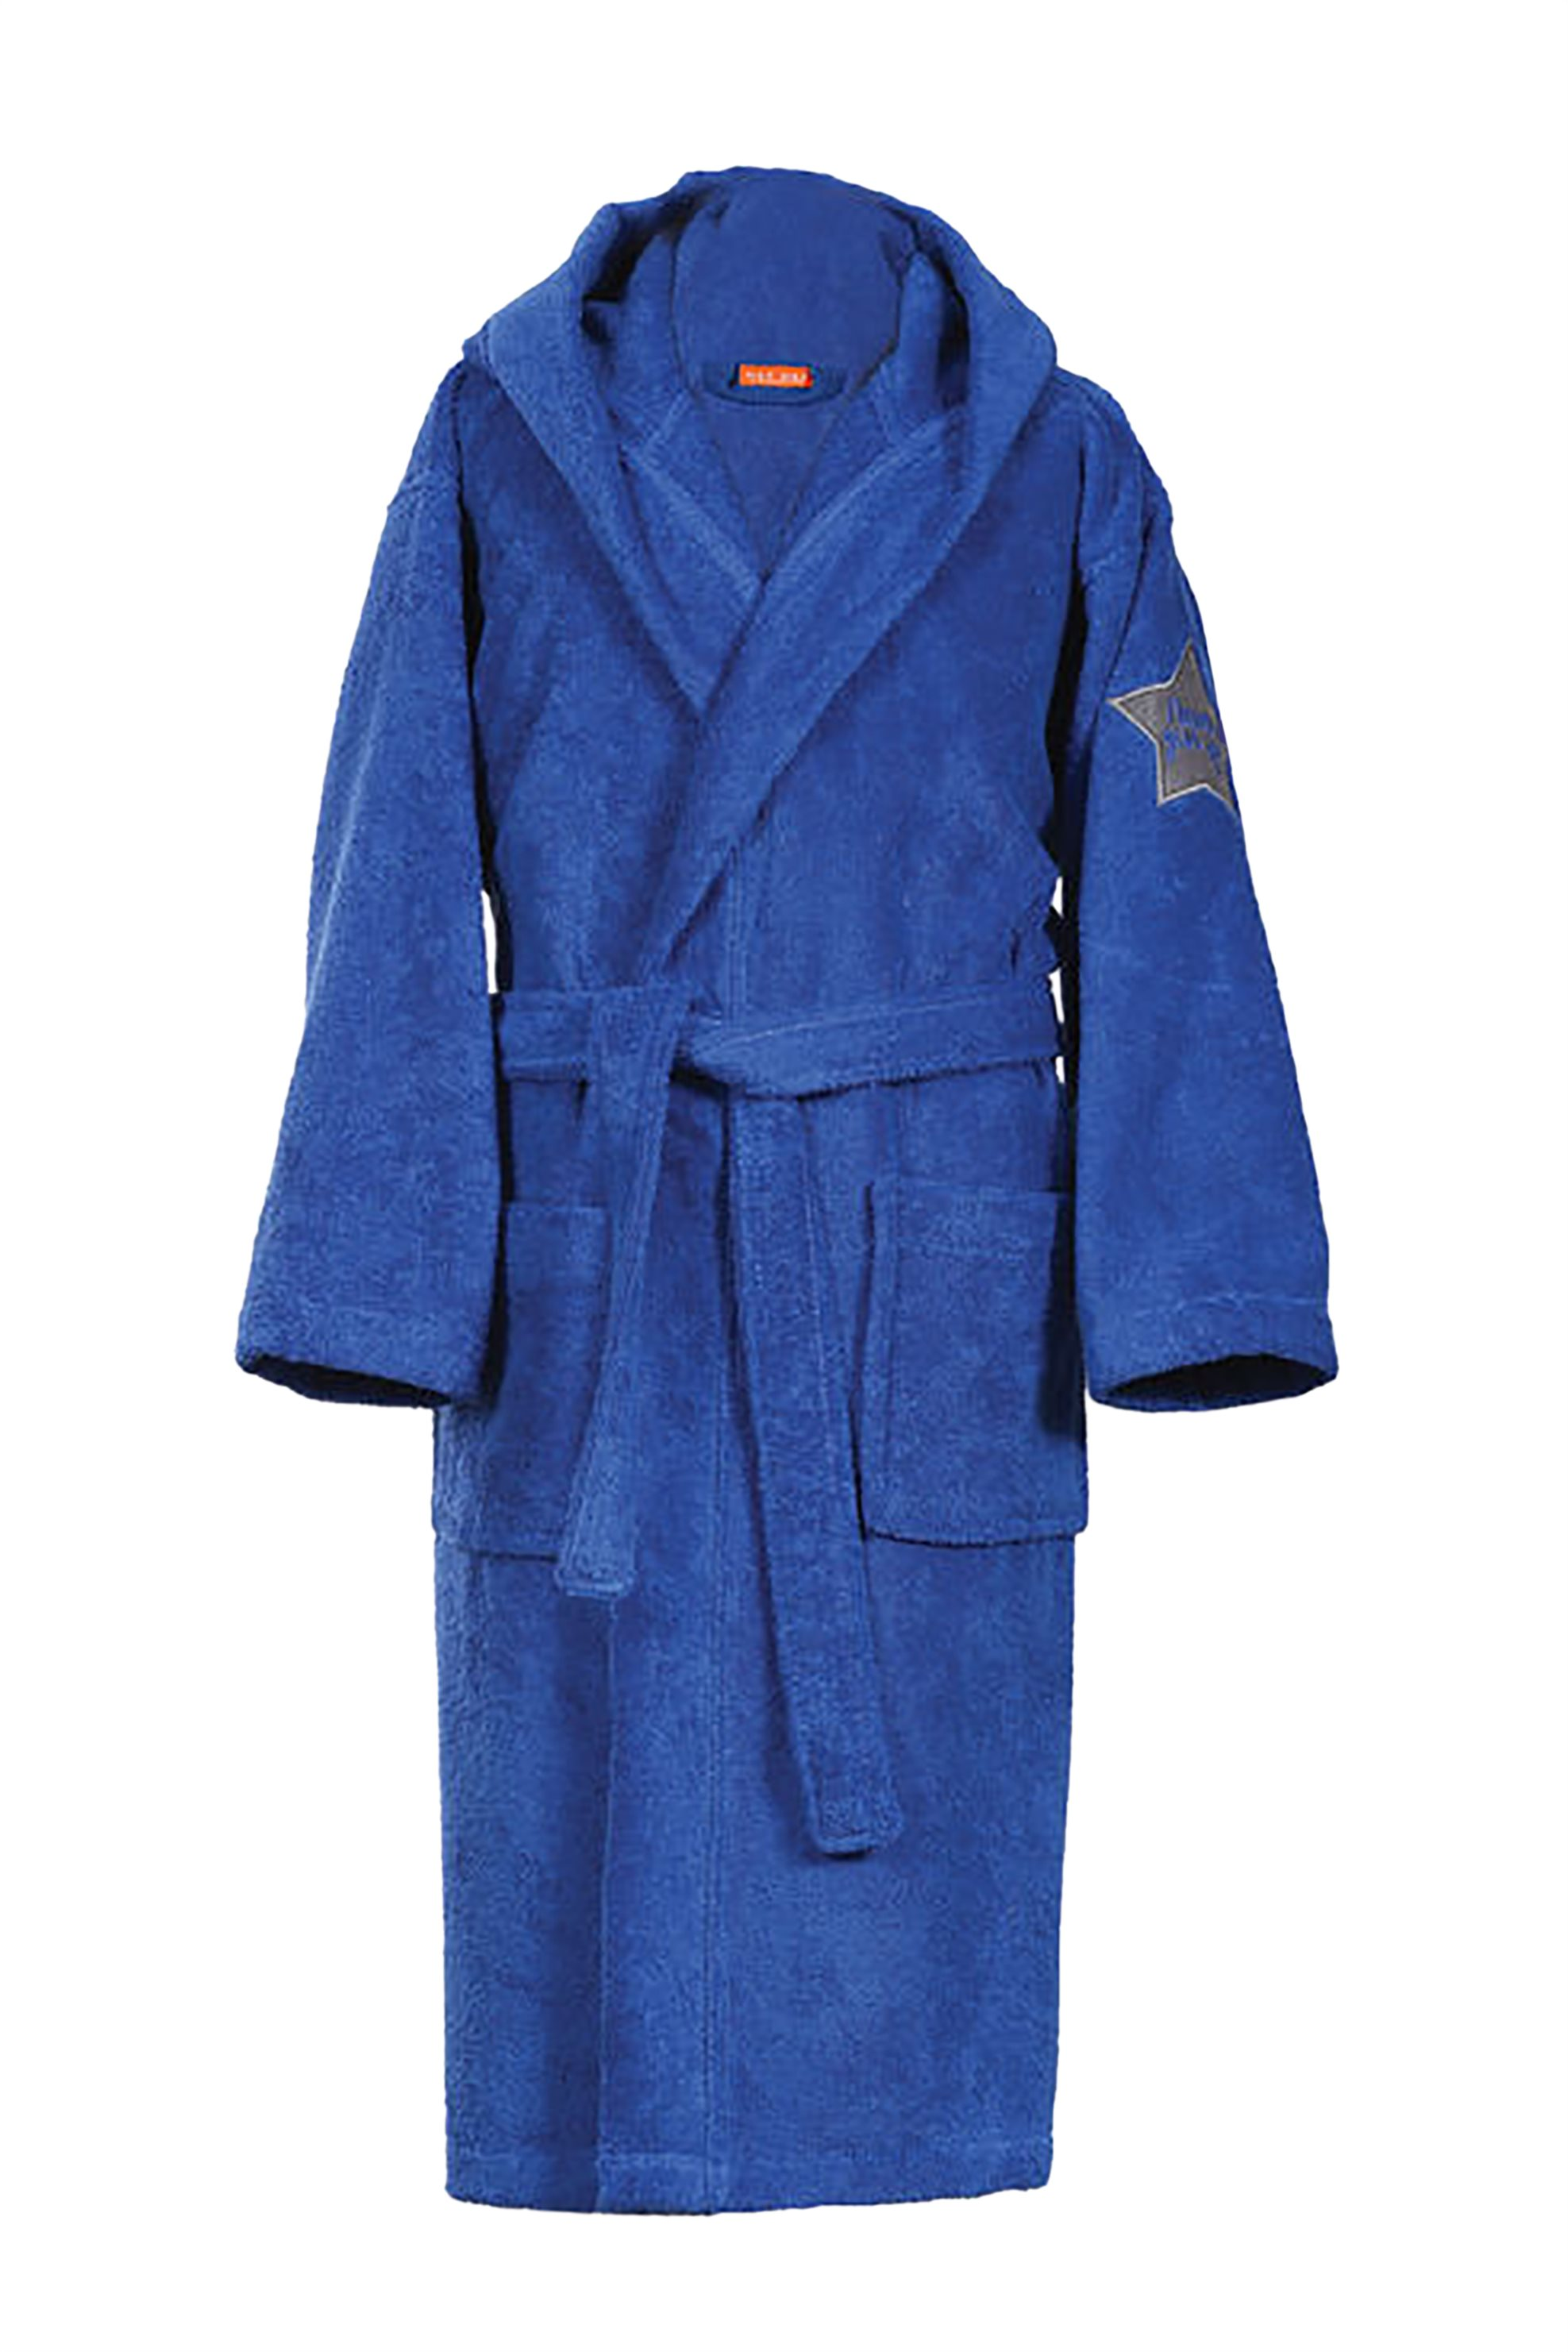 NEF-NEF Μπουρνούζι με κουκούλα μονόχρωμοJunior - 022692 - Μπλε Ηλεκτρίκ home   παιδια   παιδικά μπουρνούζια   ρόμπες